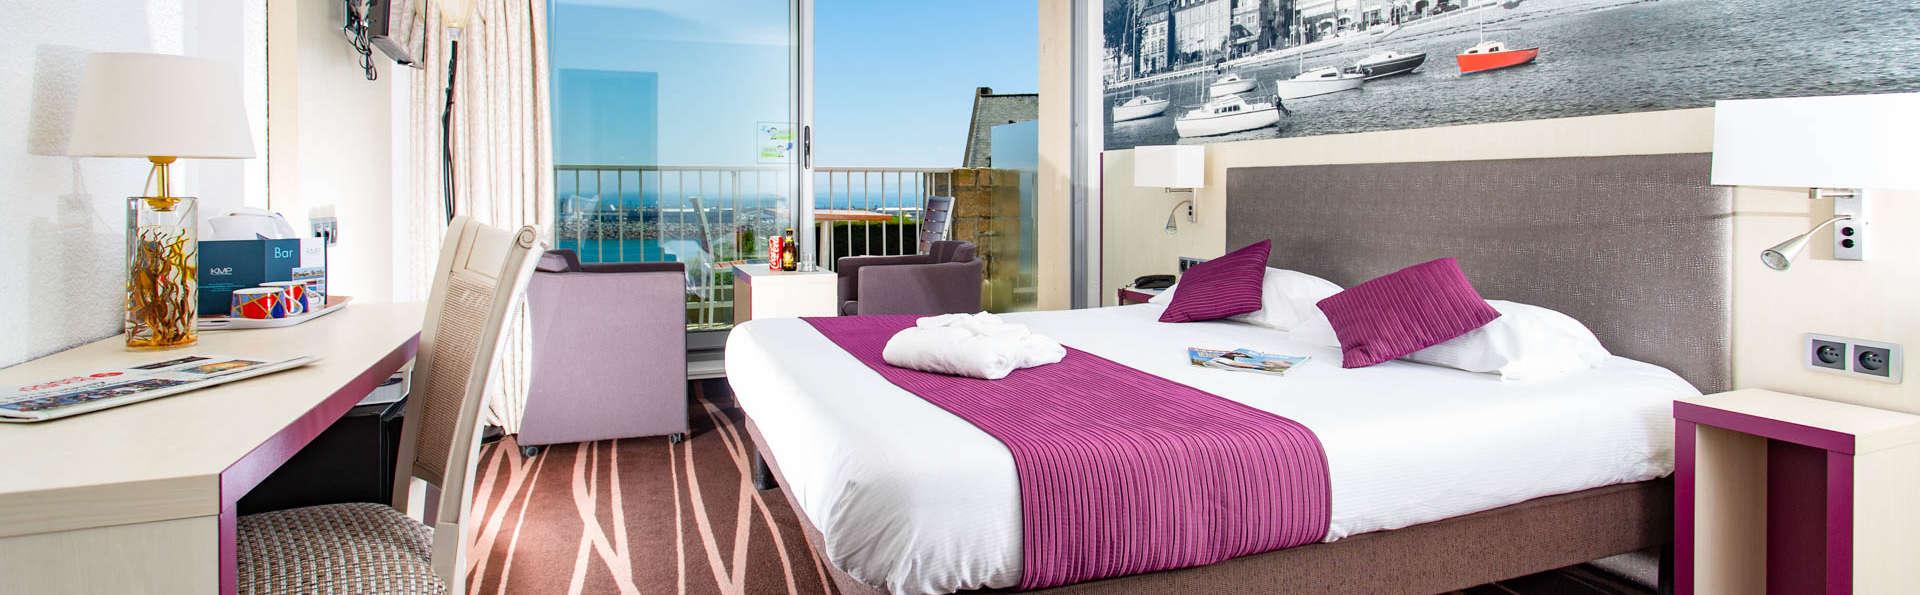 Relais Du Silence Hotel Ker Moor Préférence - EDIT_NEW_ROOM-4.jpg